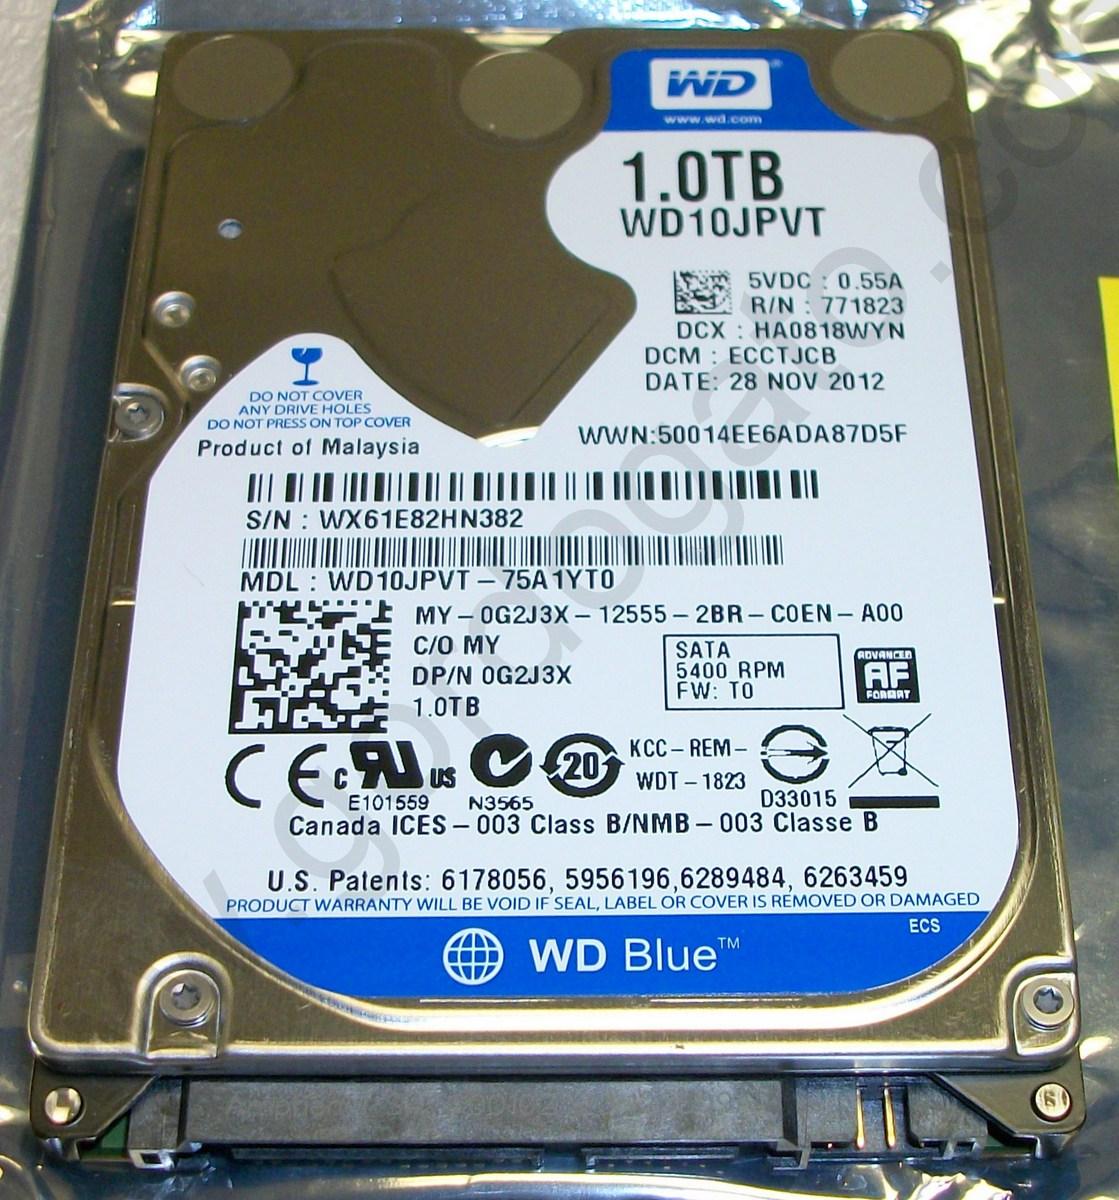 Western Digital WD10JPVT-75A1YT0 1TB Laptop Internal Hard Disk D, Gordogato's Interesting Stuff